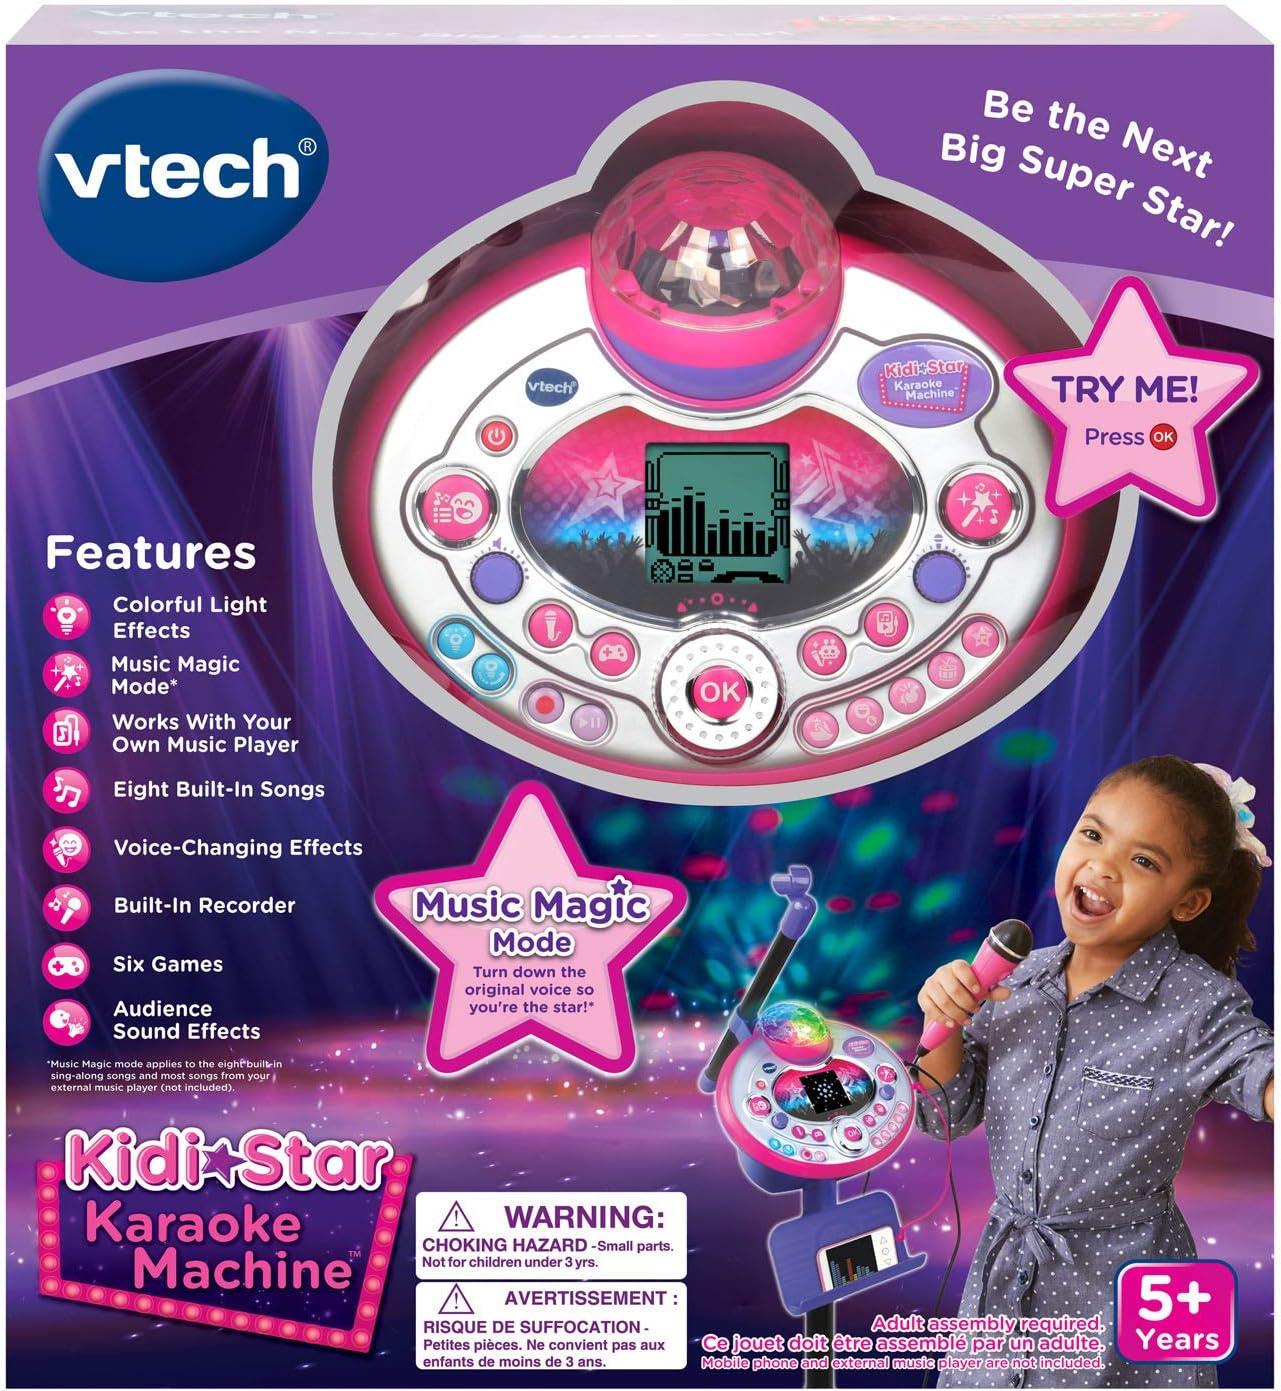 VTech Kidi Star Karaoke Machine